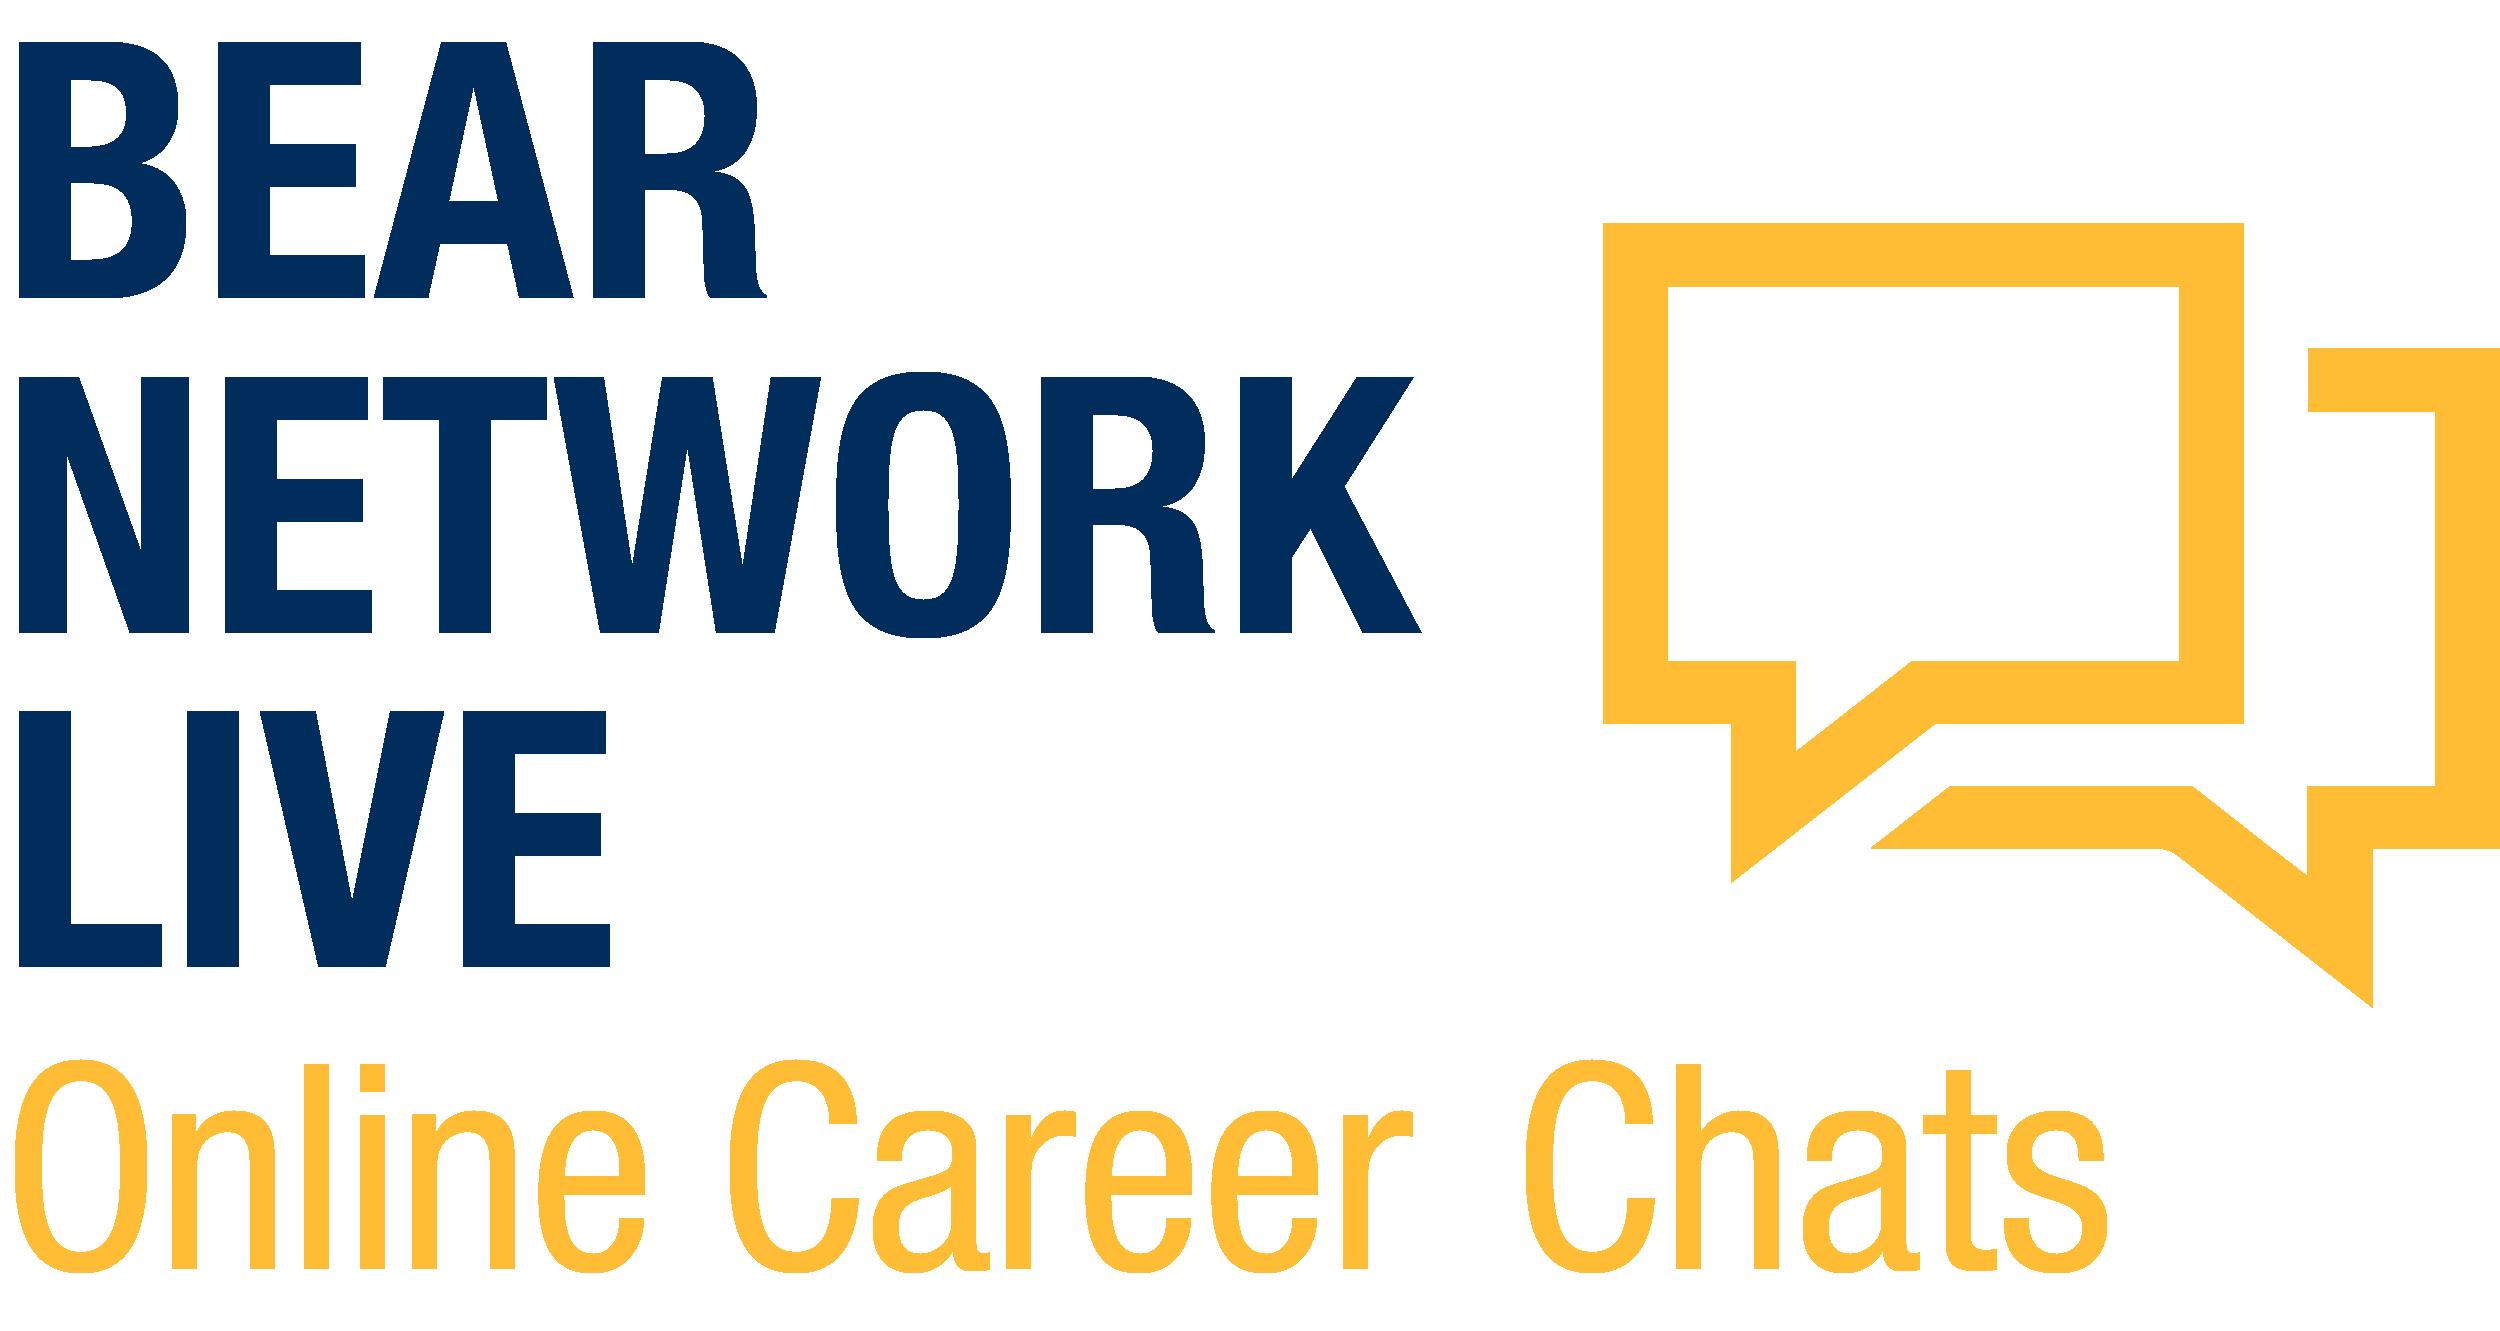 Bear Network Live logo